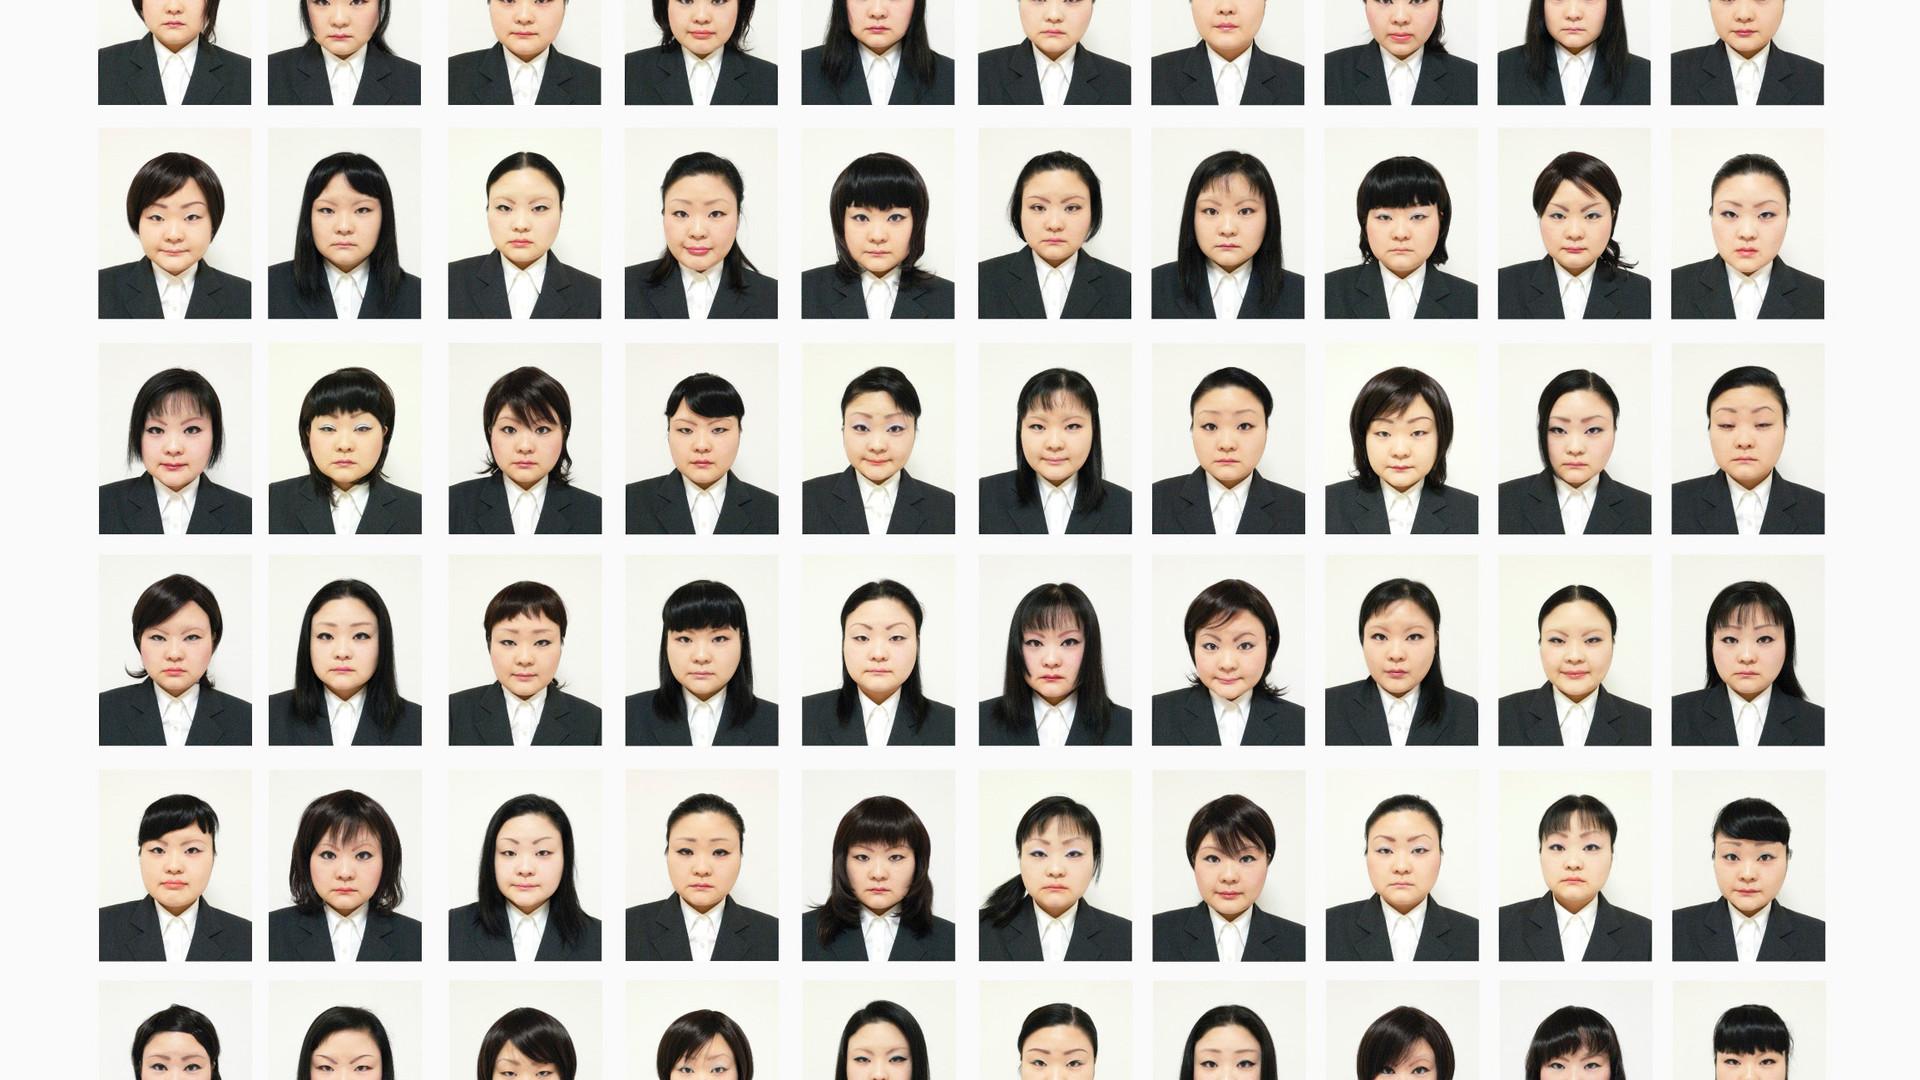 Tomoko Sawada, Recruit/Grey, 2006